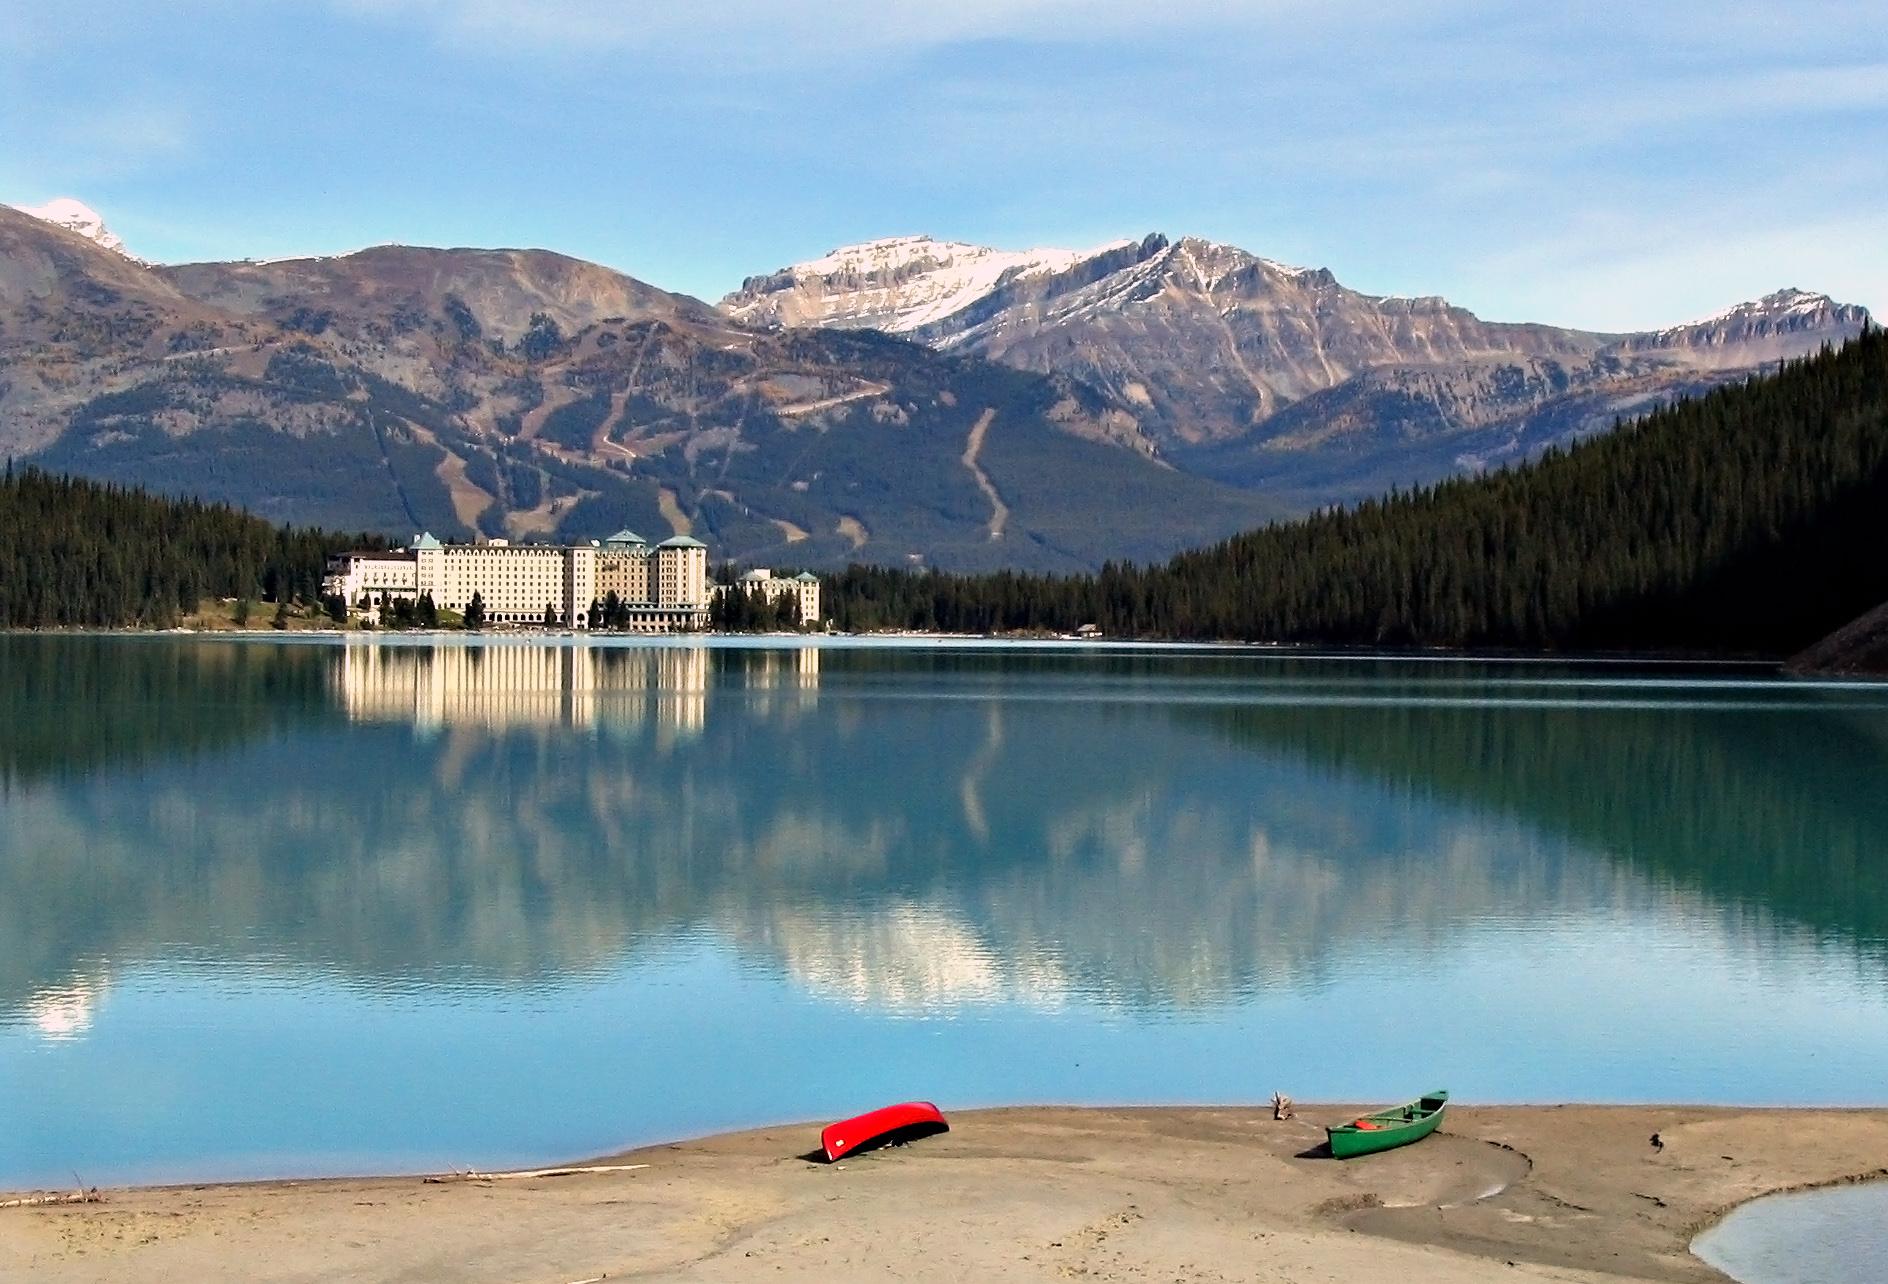 The Lake Louise Mountain Resort, Lake Louise, Canada. (Image: wikimedia / CC0 1.0)